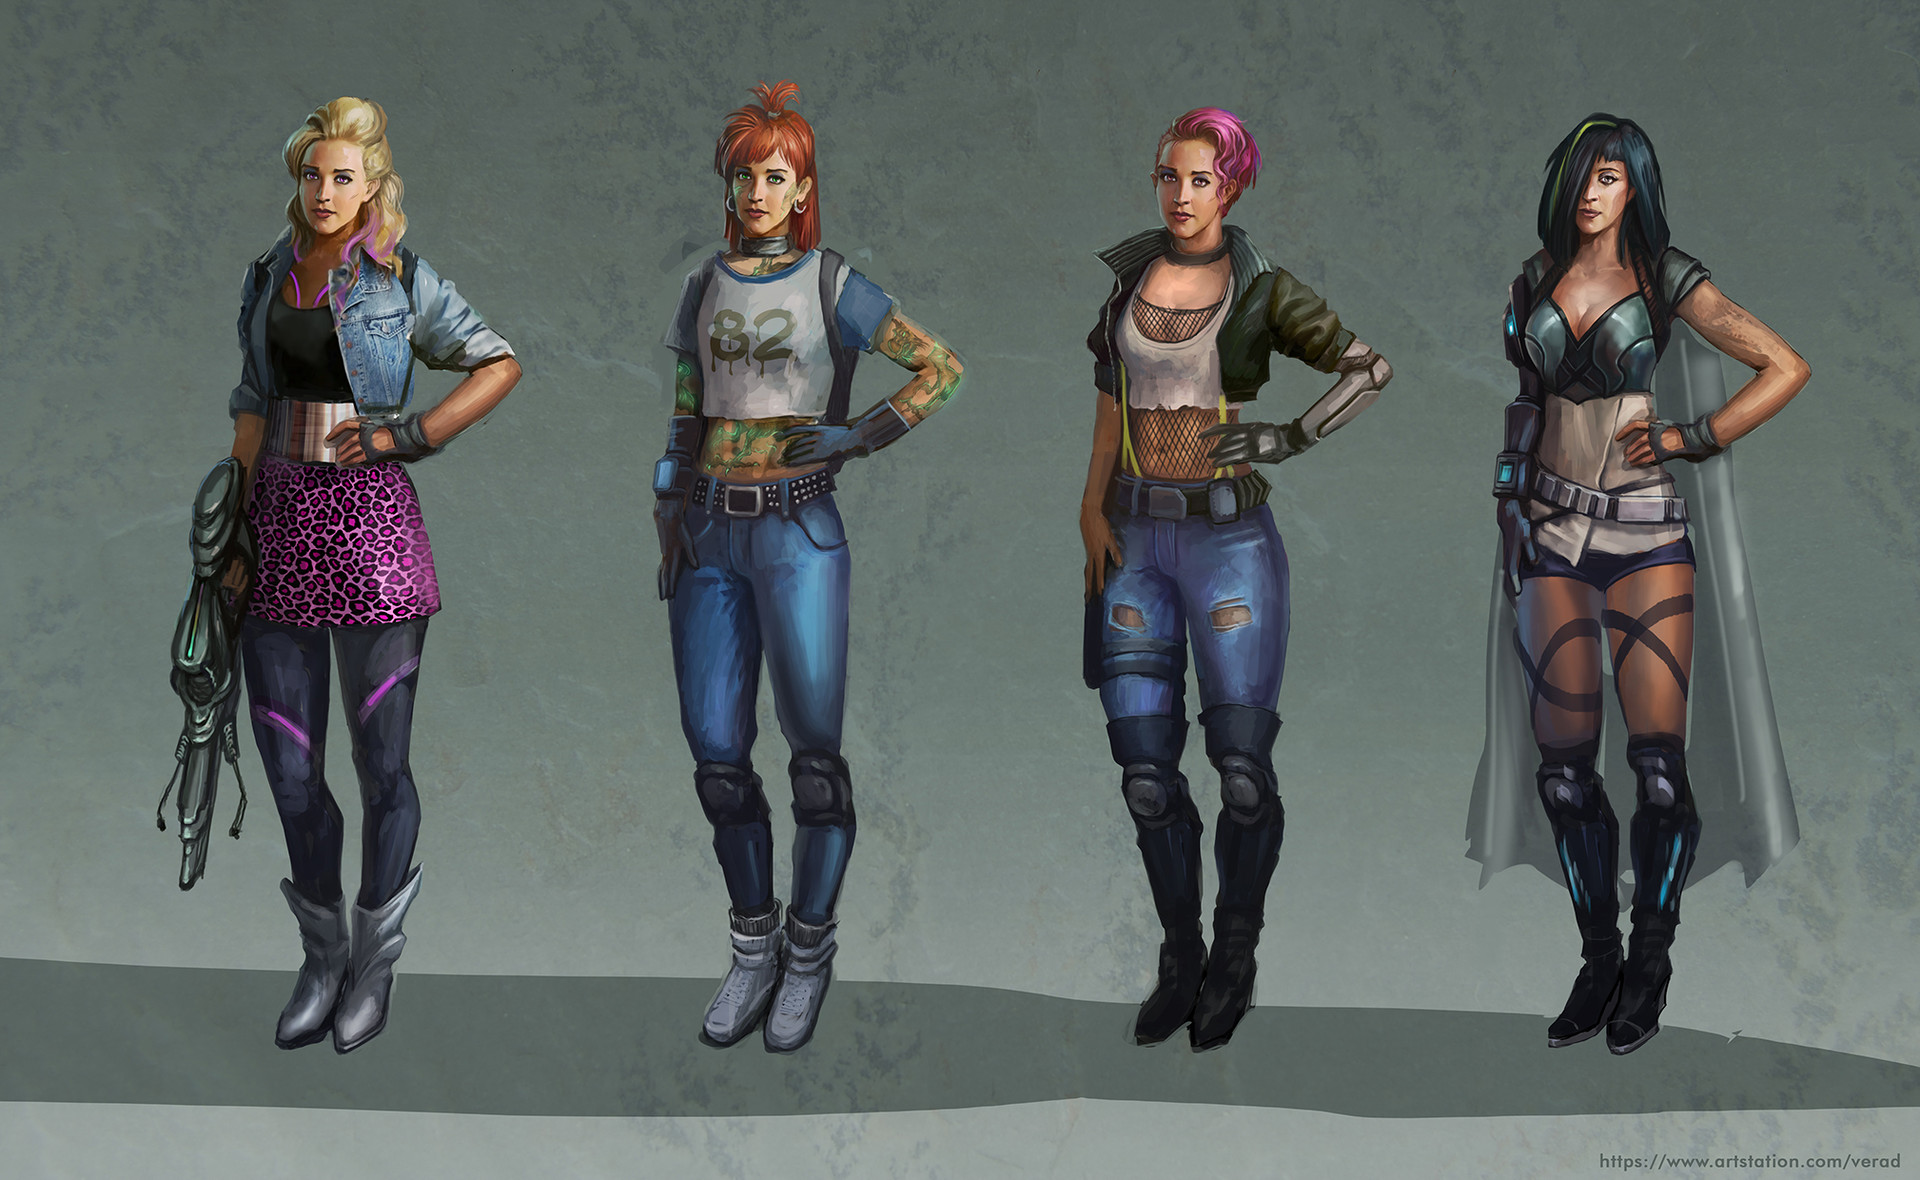 Fashion Picture: Cyberpunk Girls, Vera Dakhova